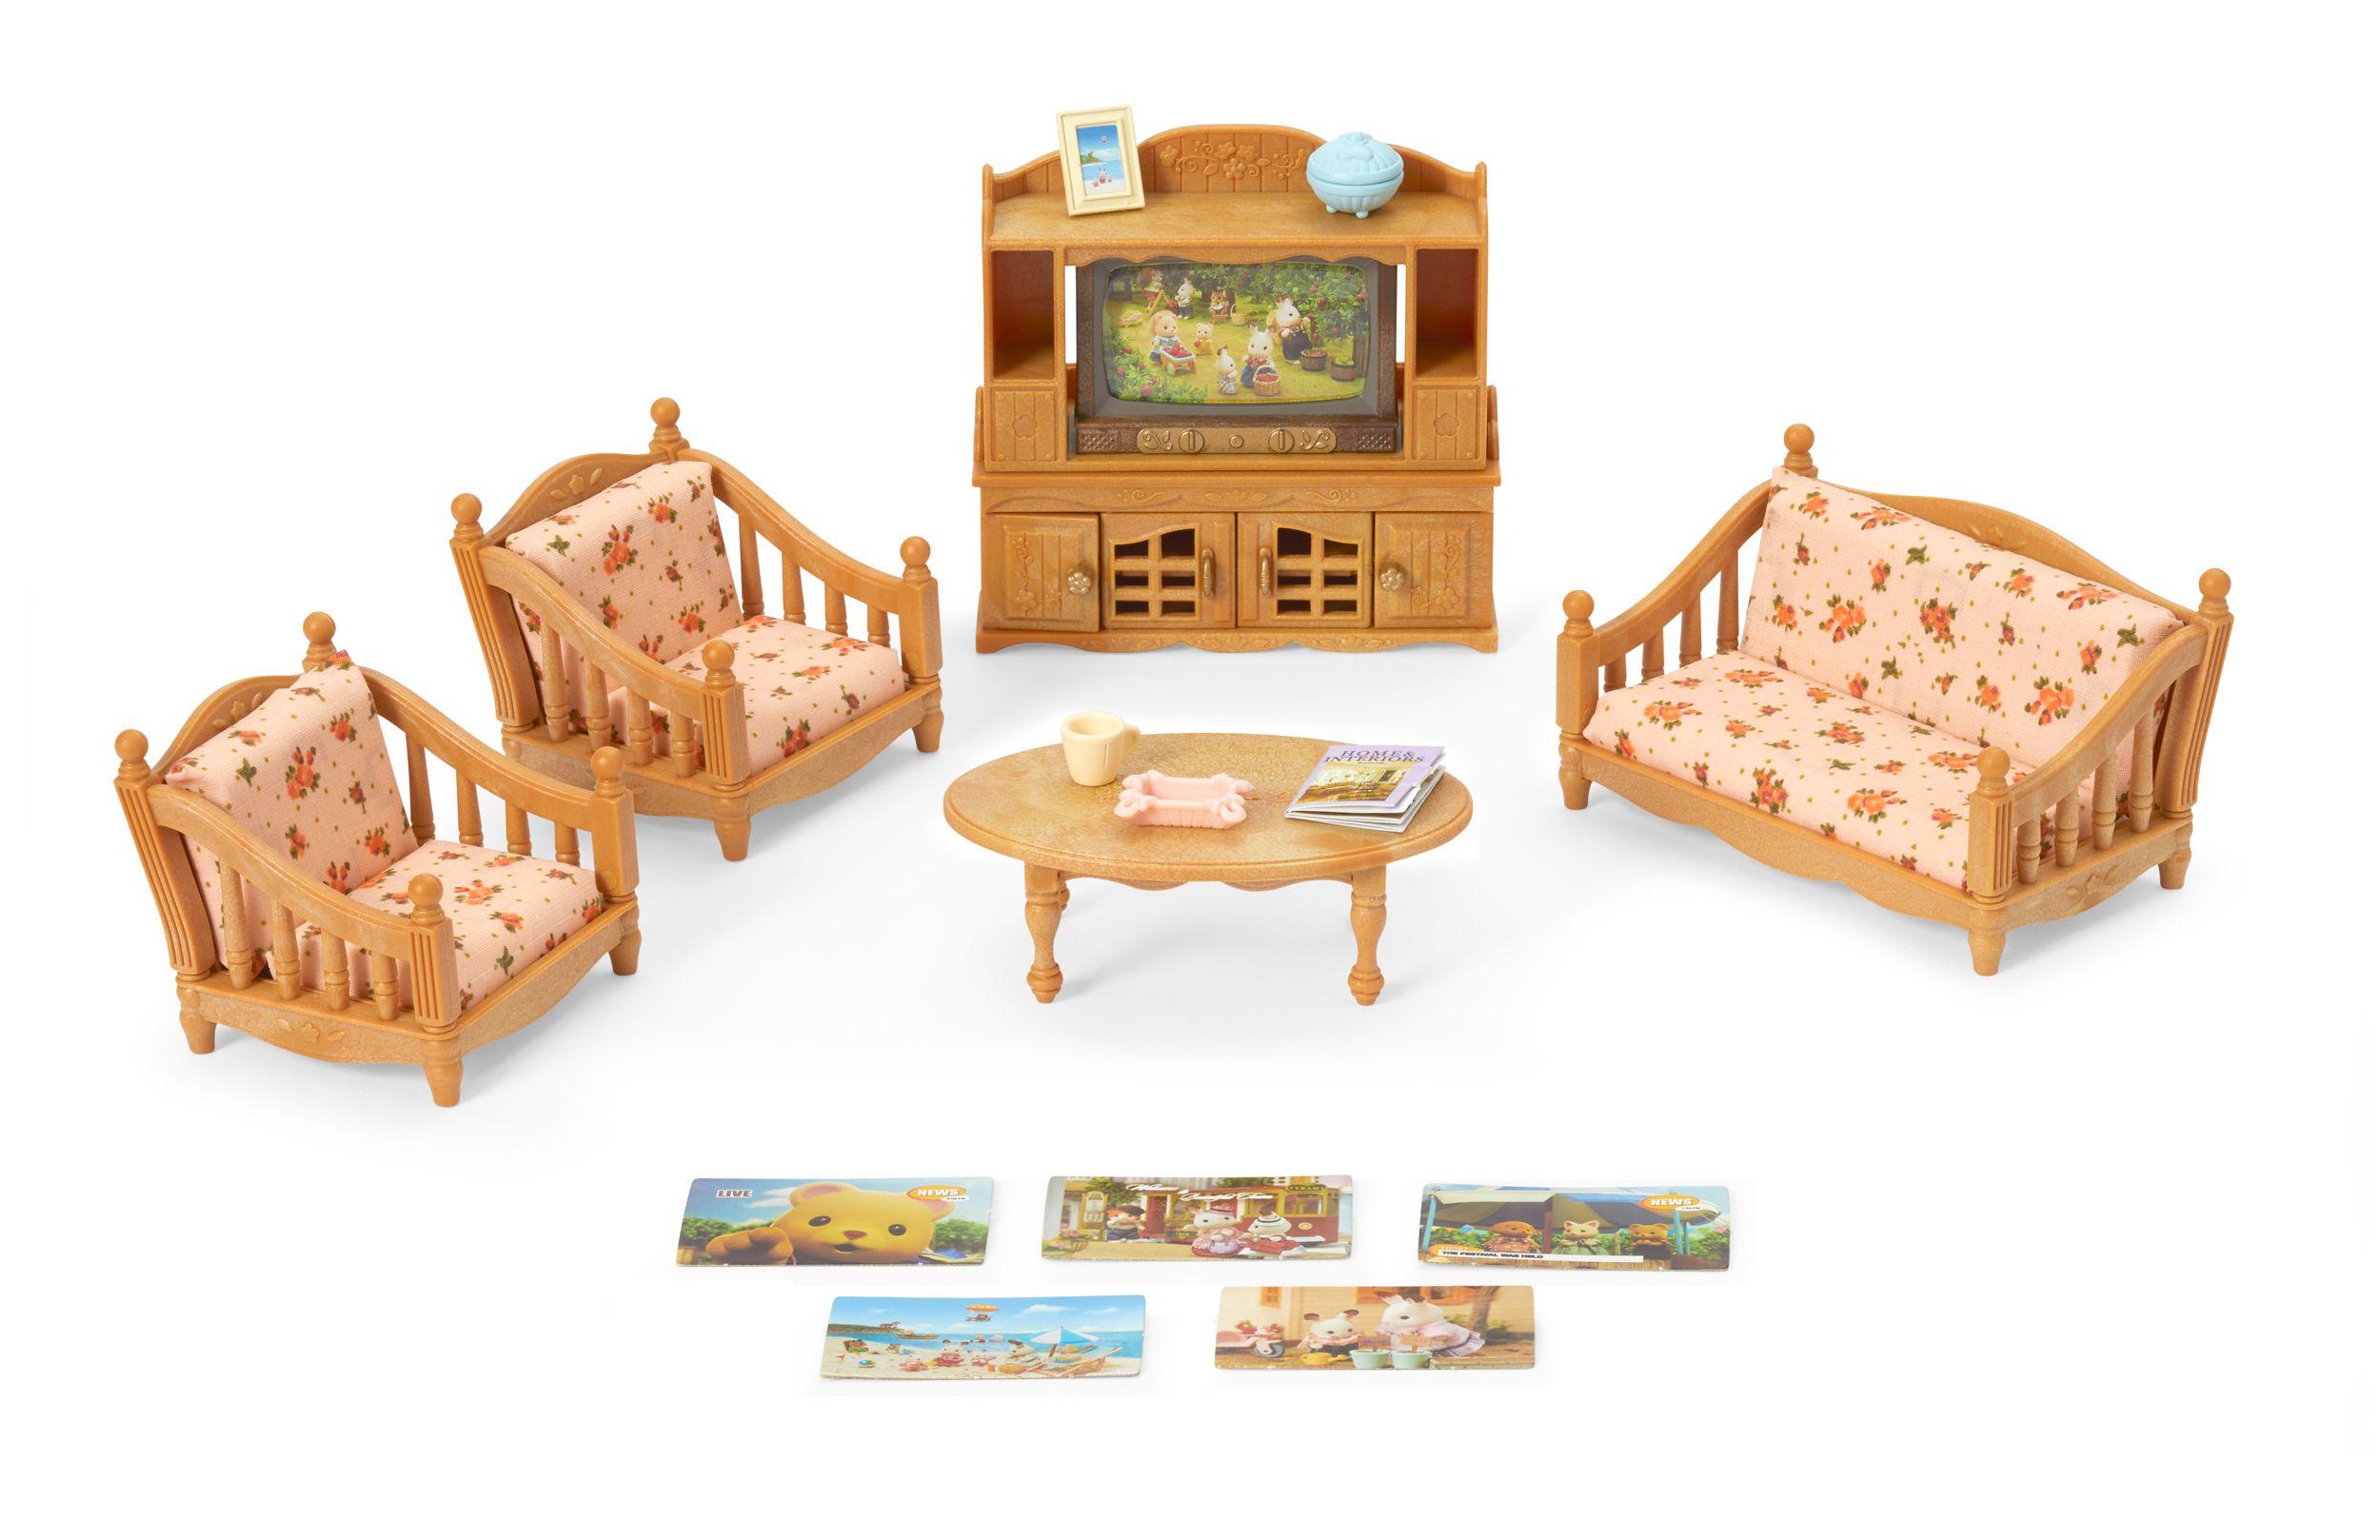 Calico Critters Comfy Living Room Set Furniture Accessories Walmart Com In 2020 Living Room Sets Comfy Living Room Calico Critters Furniture